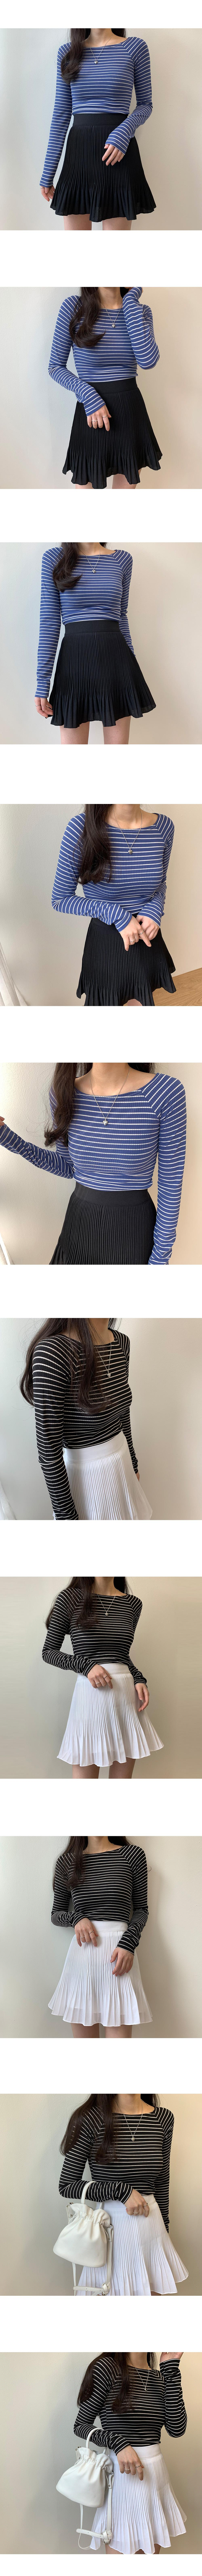 Striped Striped Square Neck Tee